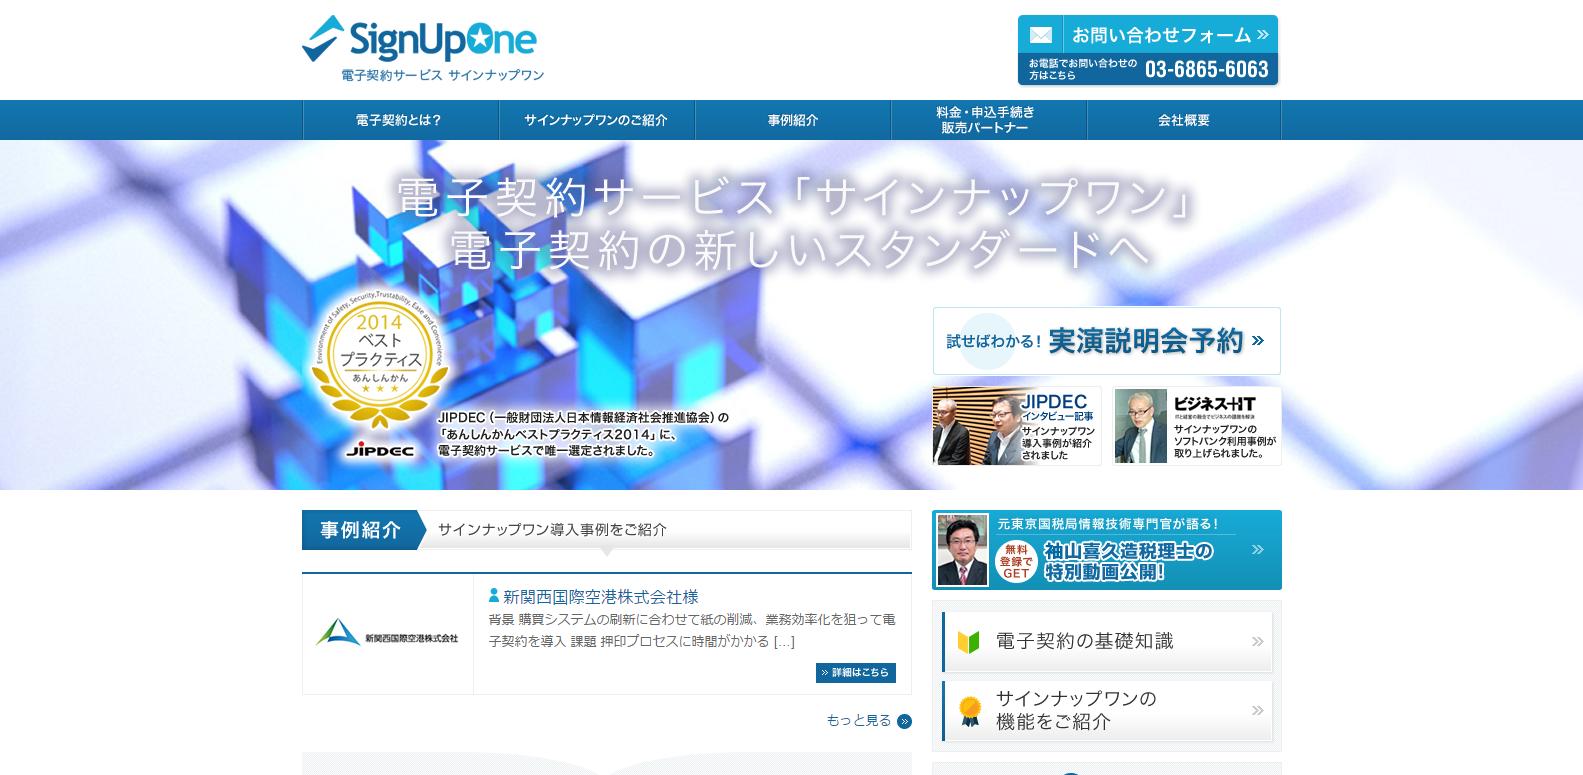 FireShot Capture 1 - 電子契約は、ソフトバンクの「サインナップワン」_ - http___www.purchaseone.info_signup-one_